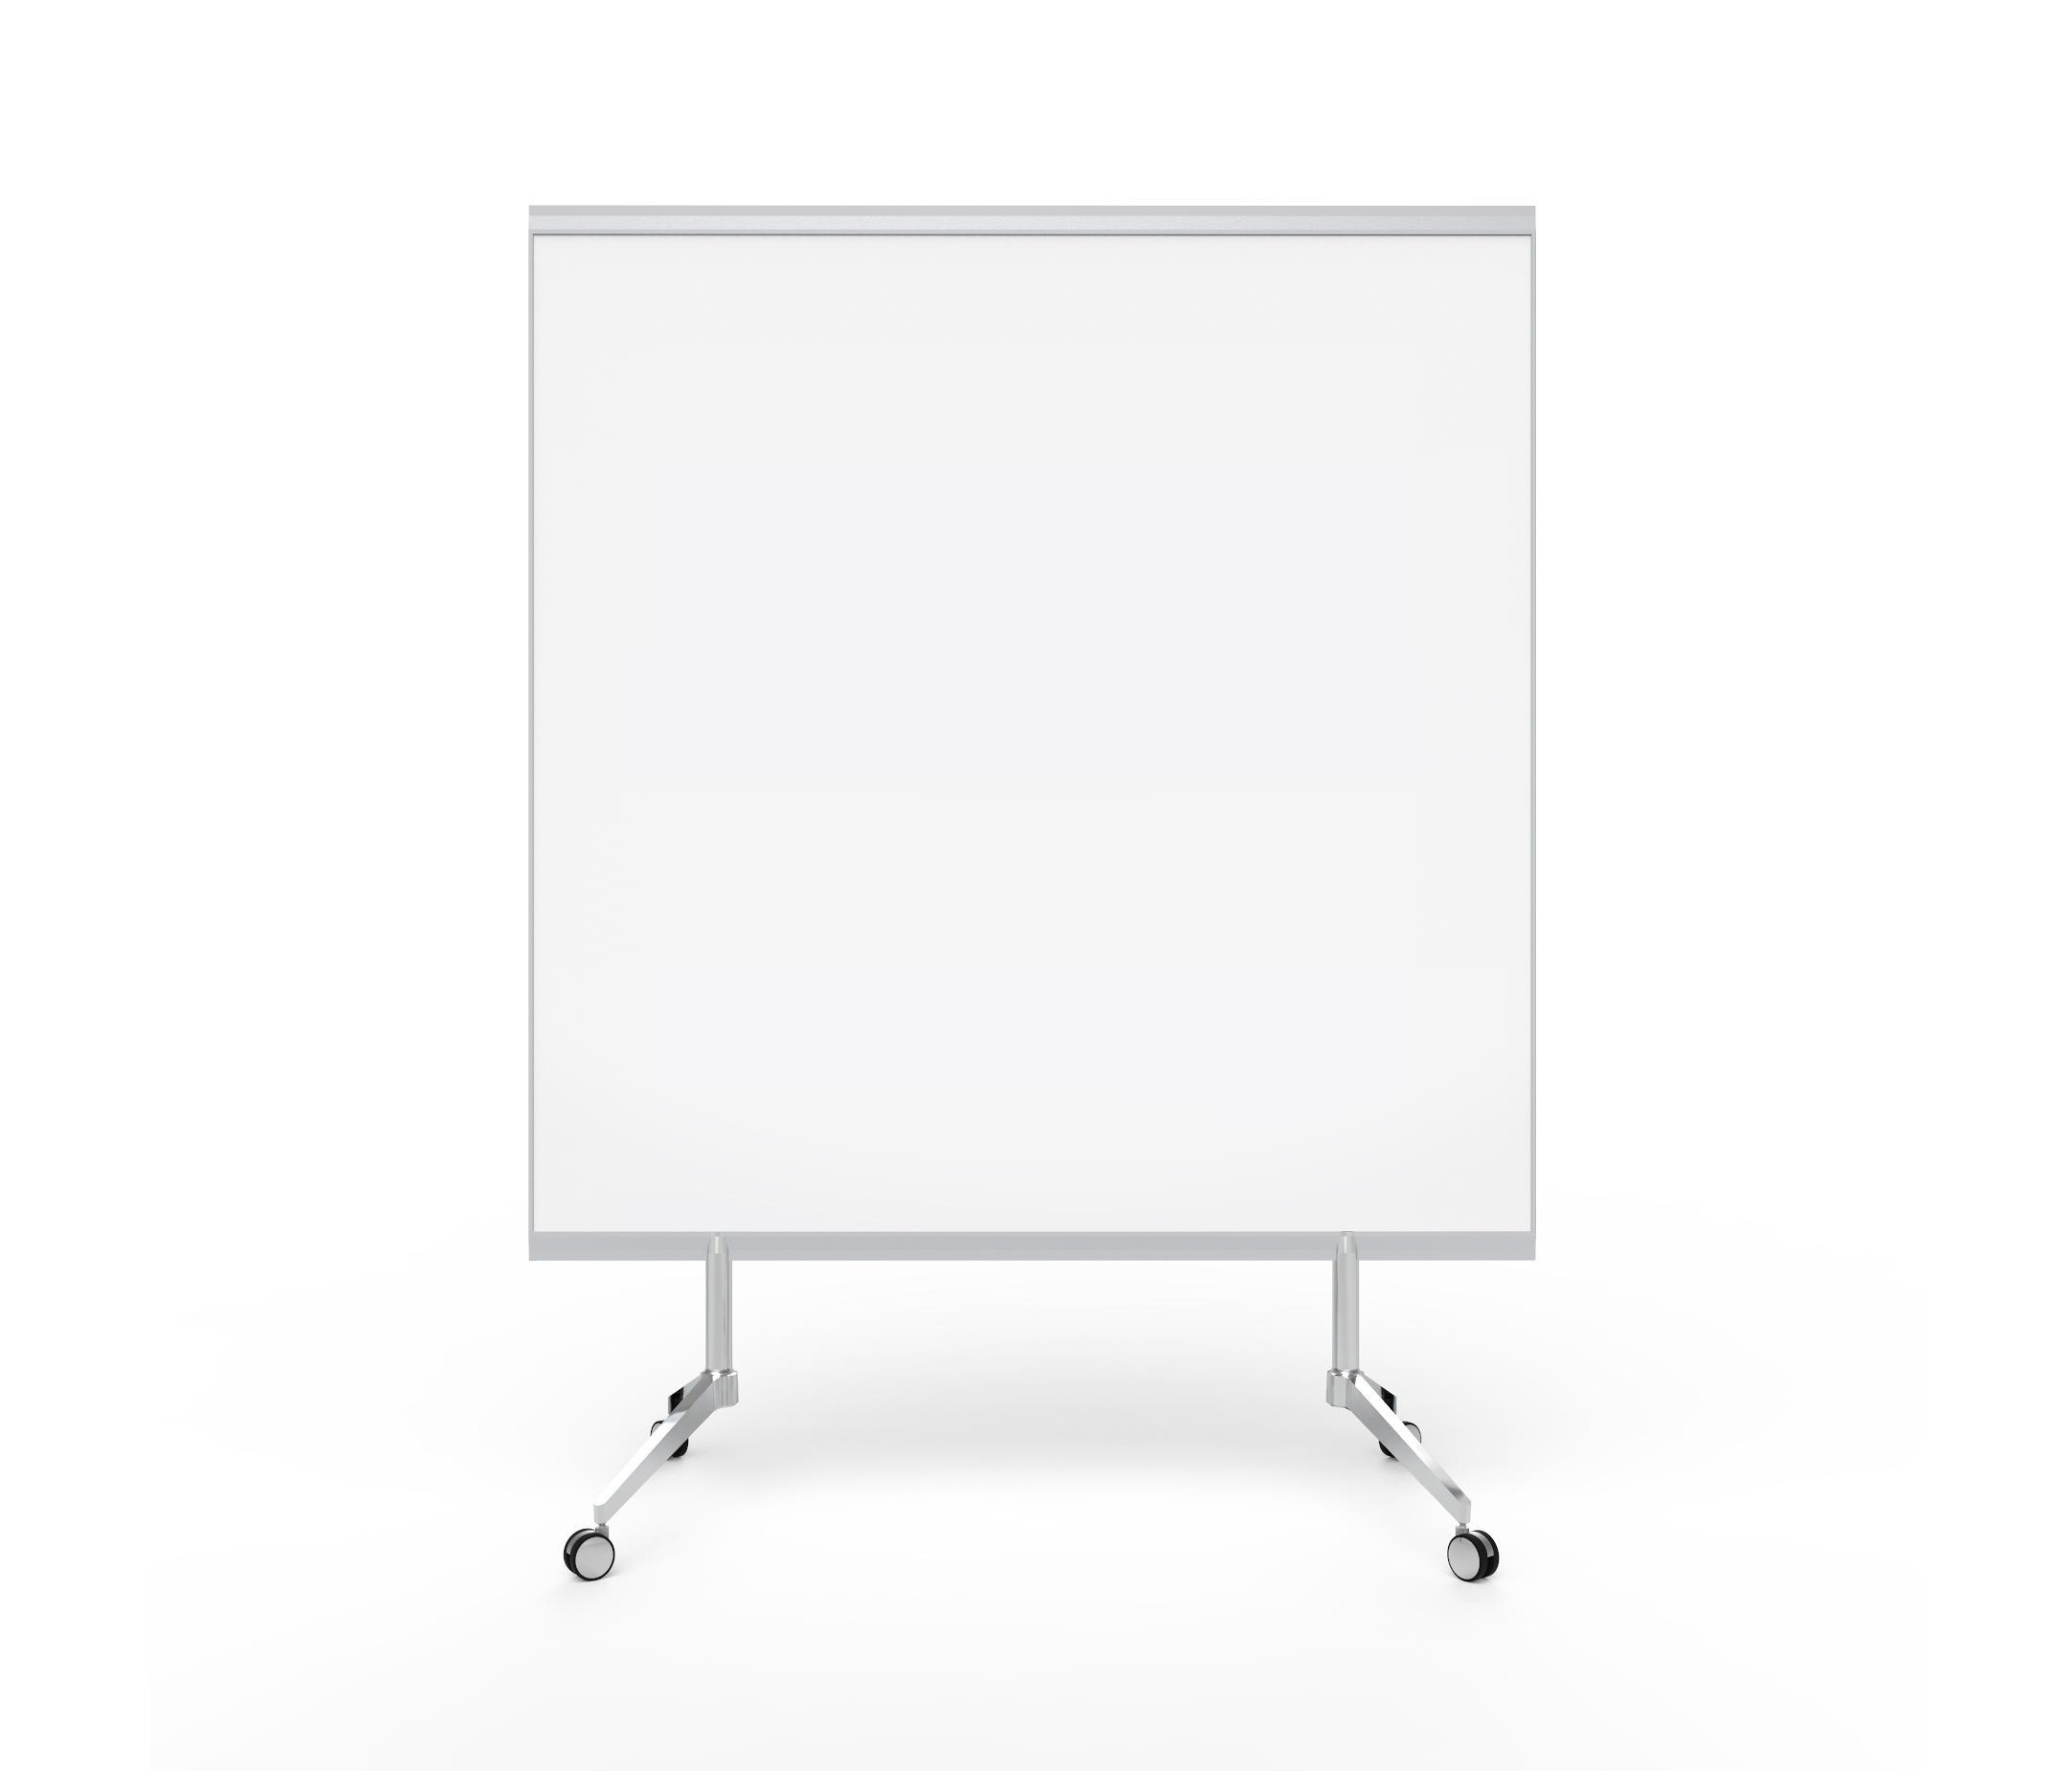 Bathroom Paneling Whiteboard 201x300.jpg M3 Mobile Whiteboard by Lintex | Flip charts - Writing boards